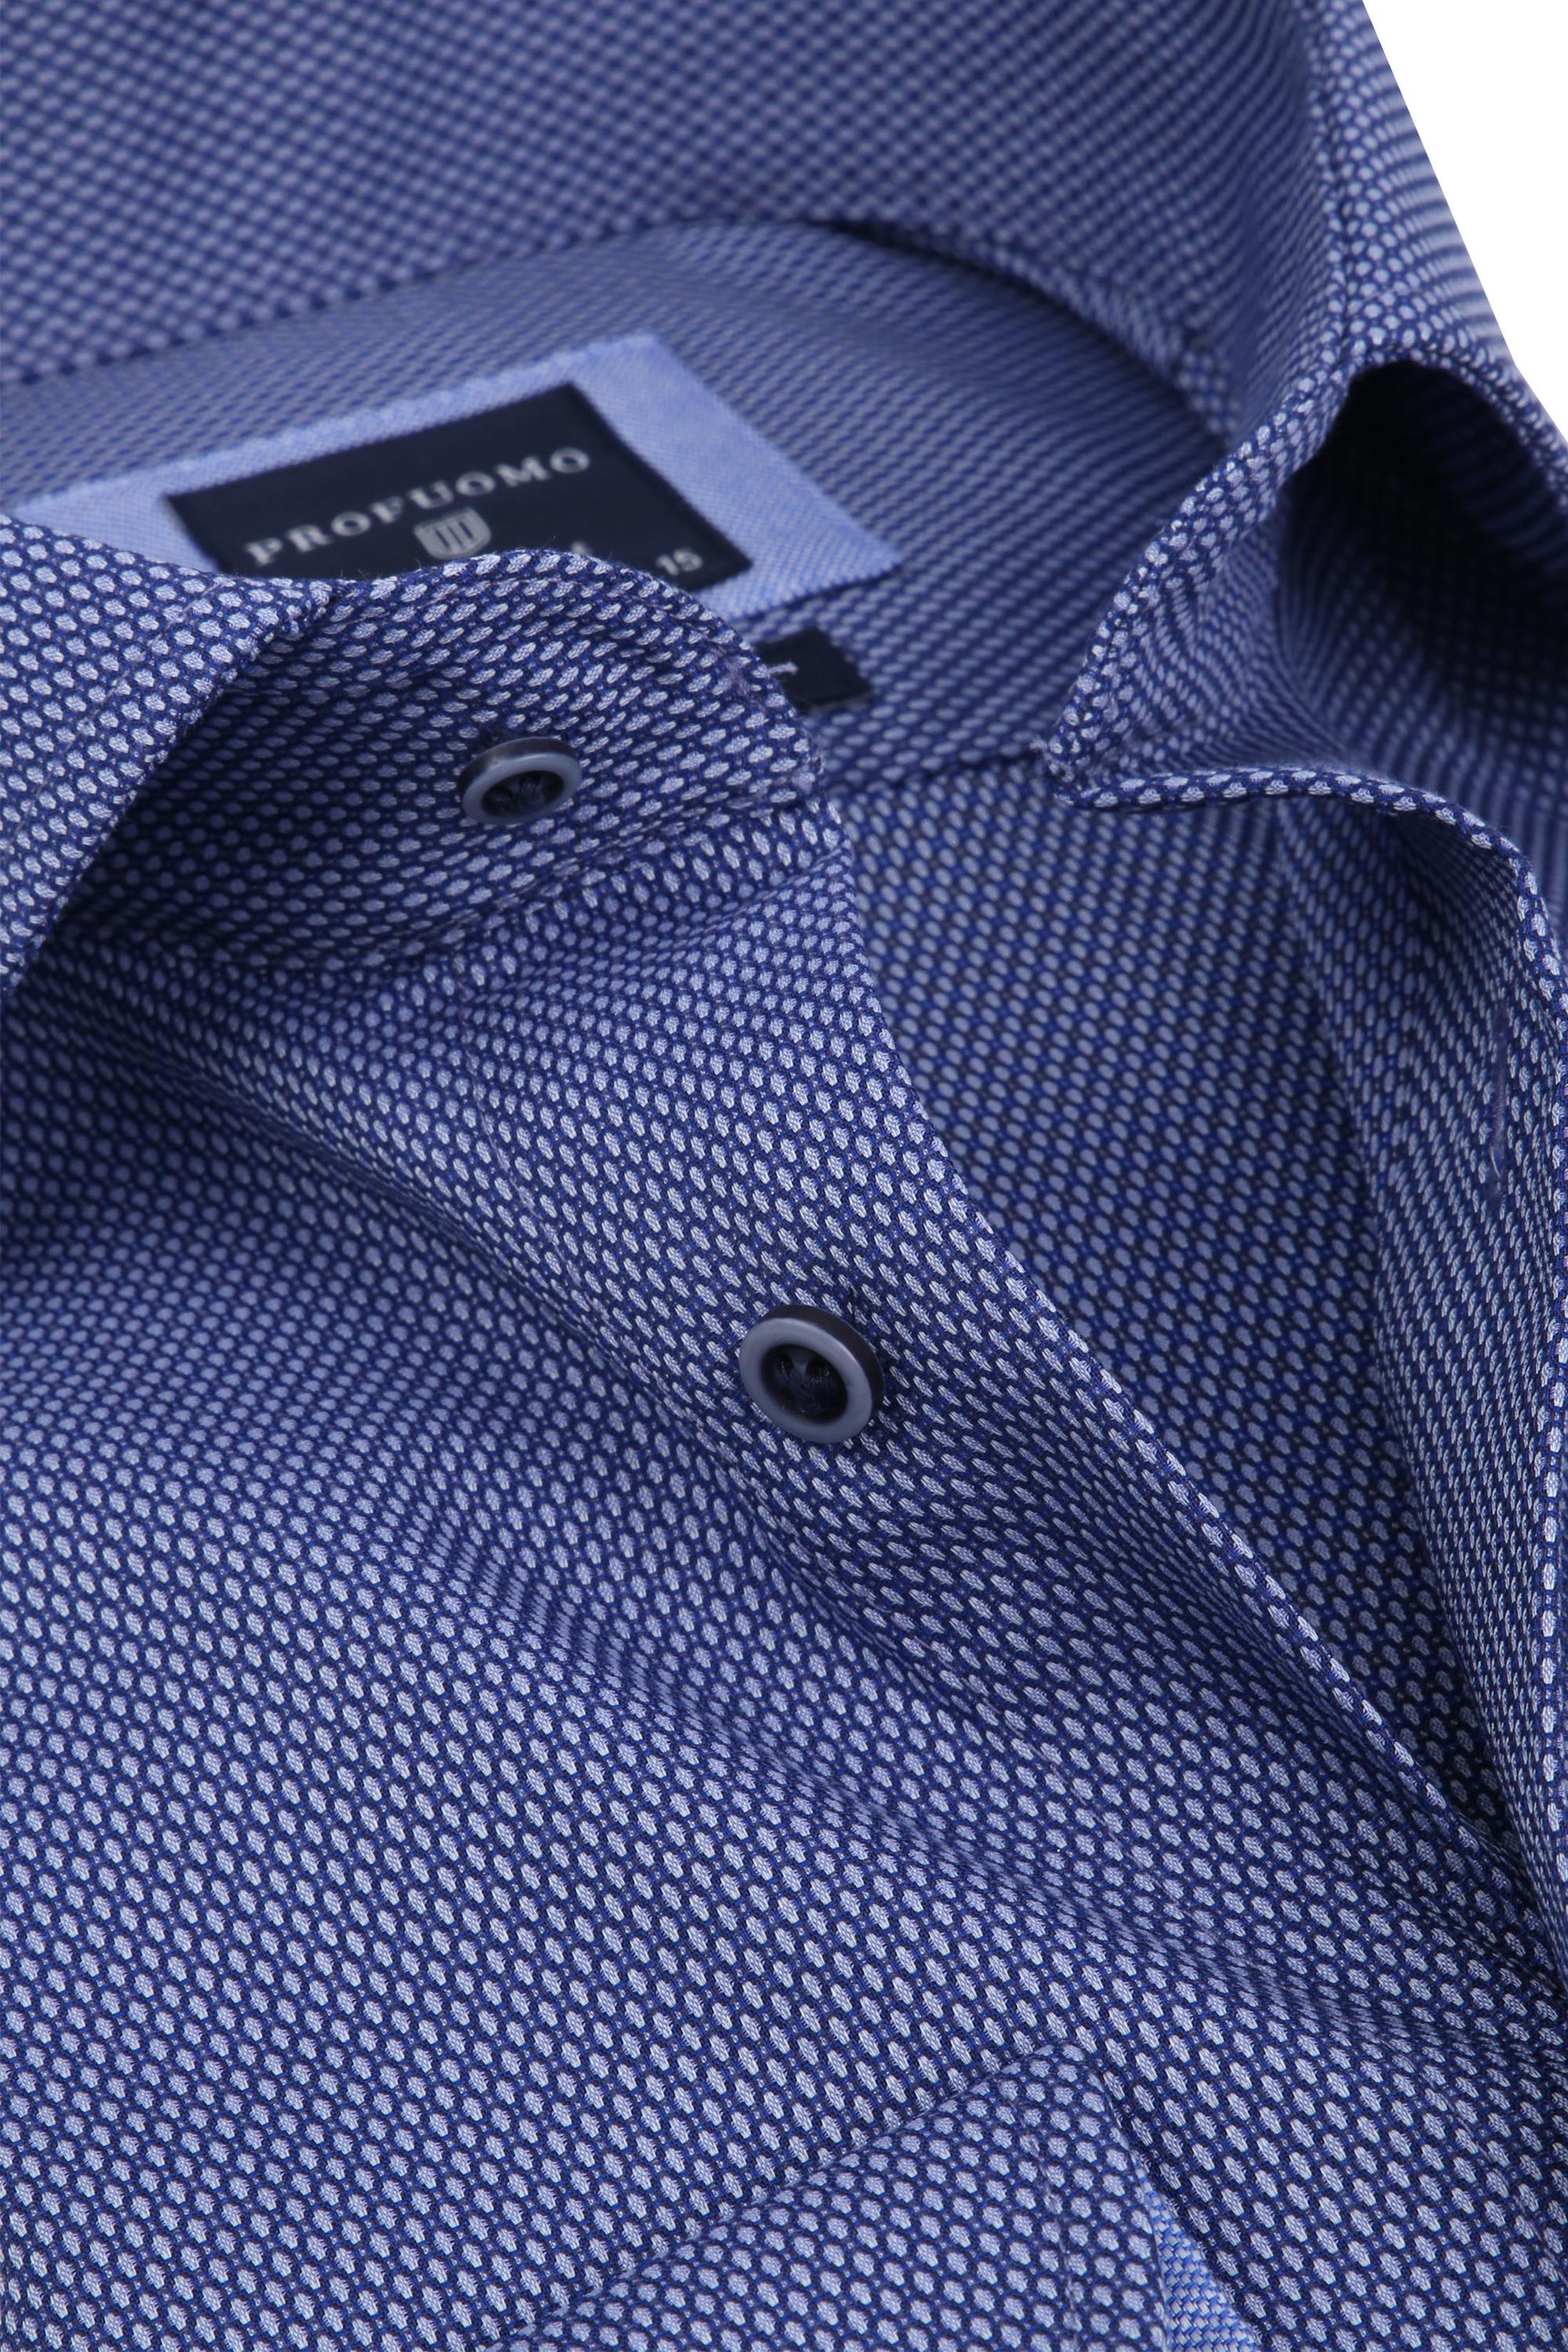 Profuomo Overhemd Slim-Fit Non Iron Blauw foto 1